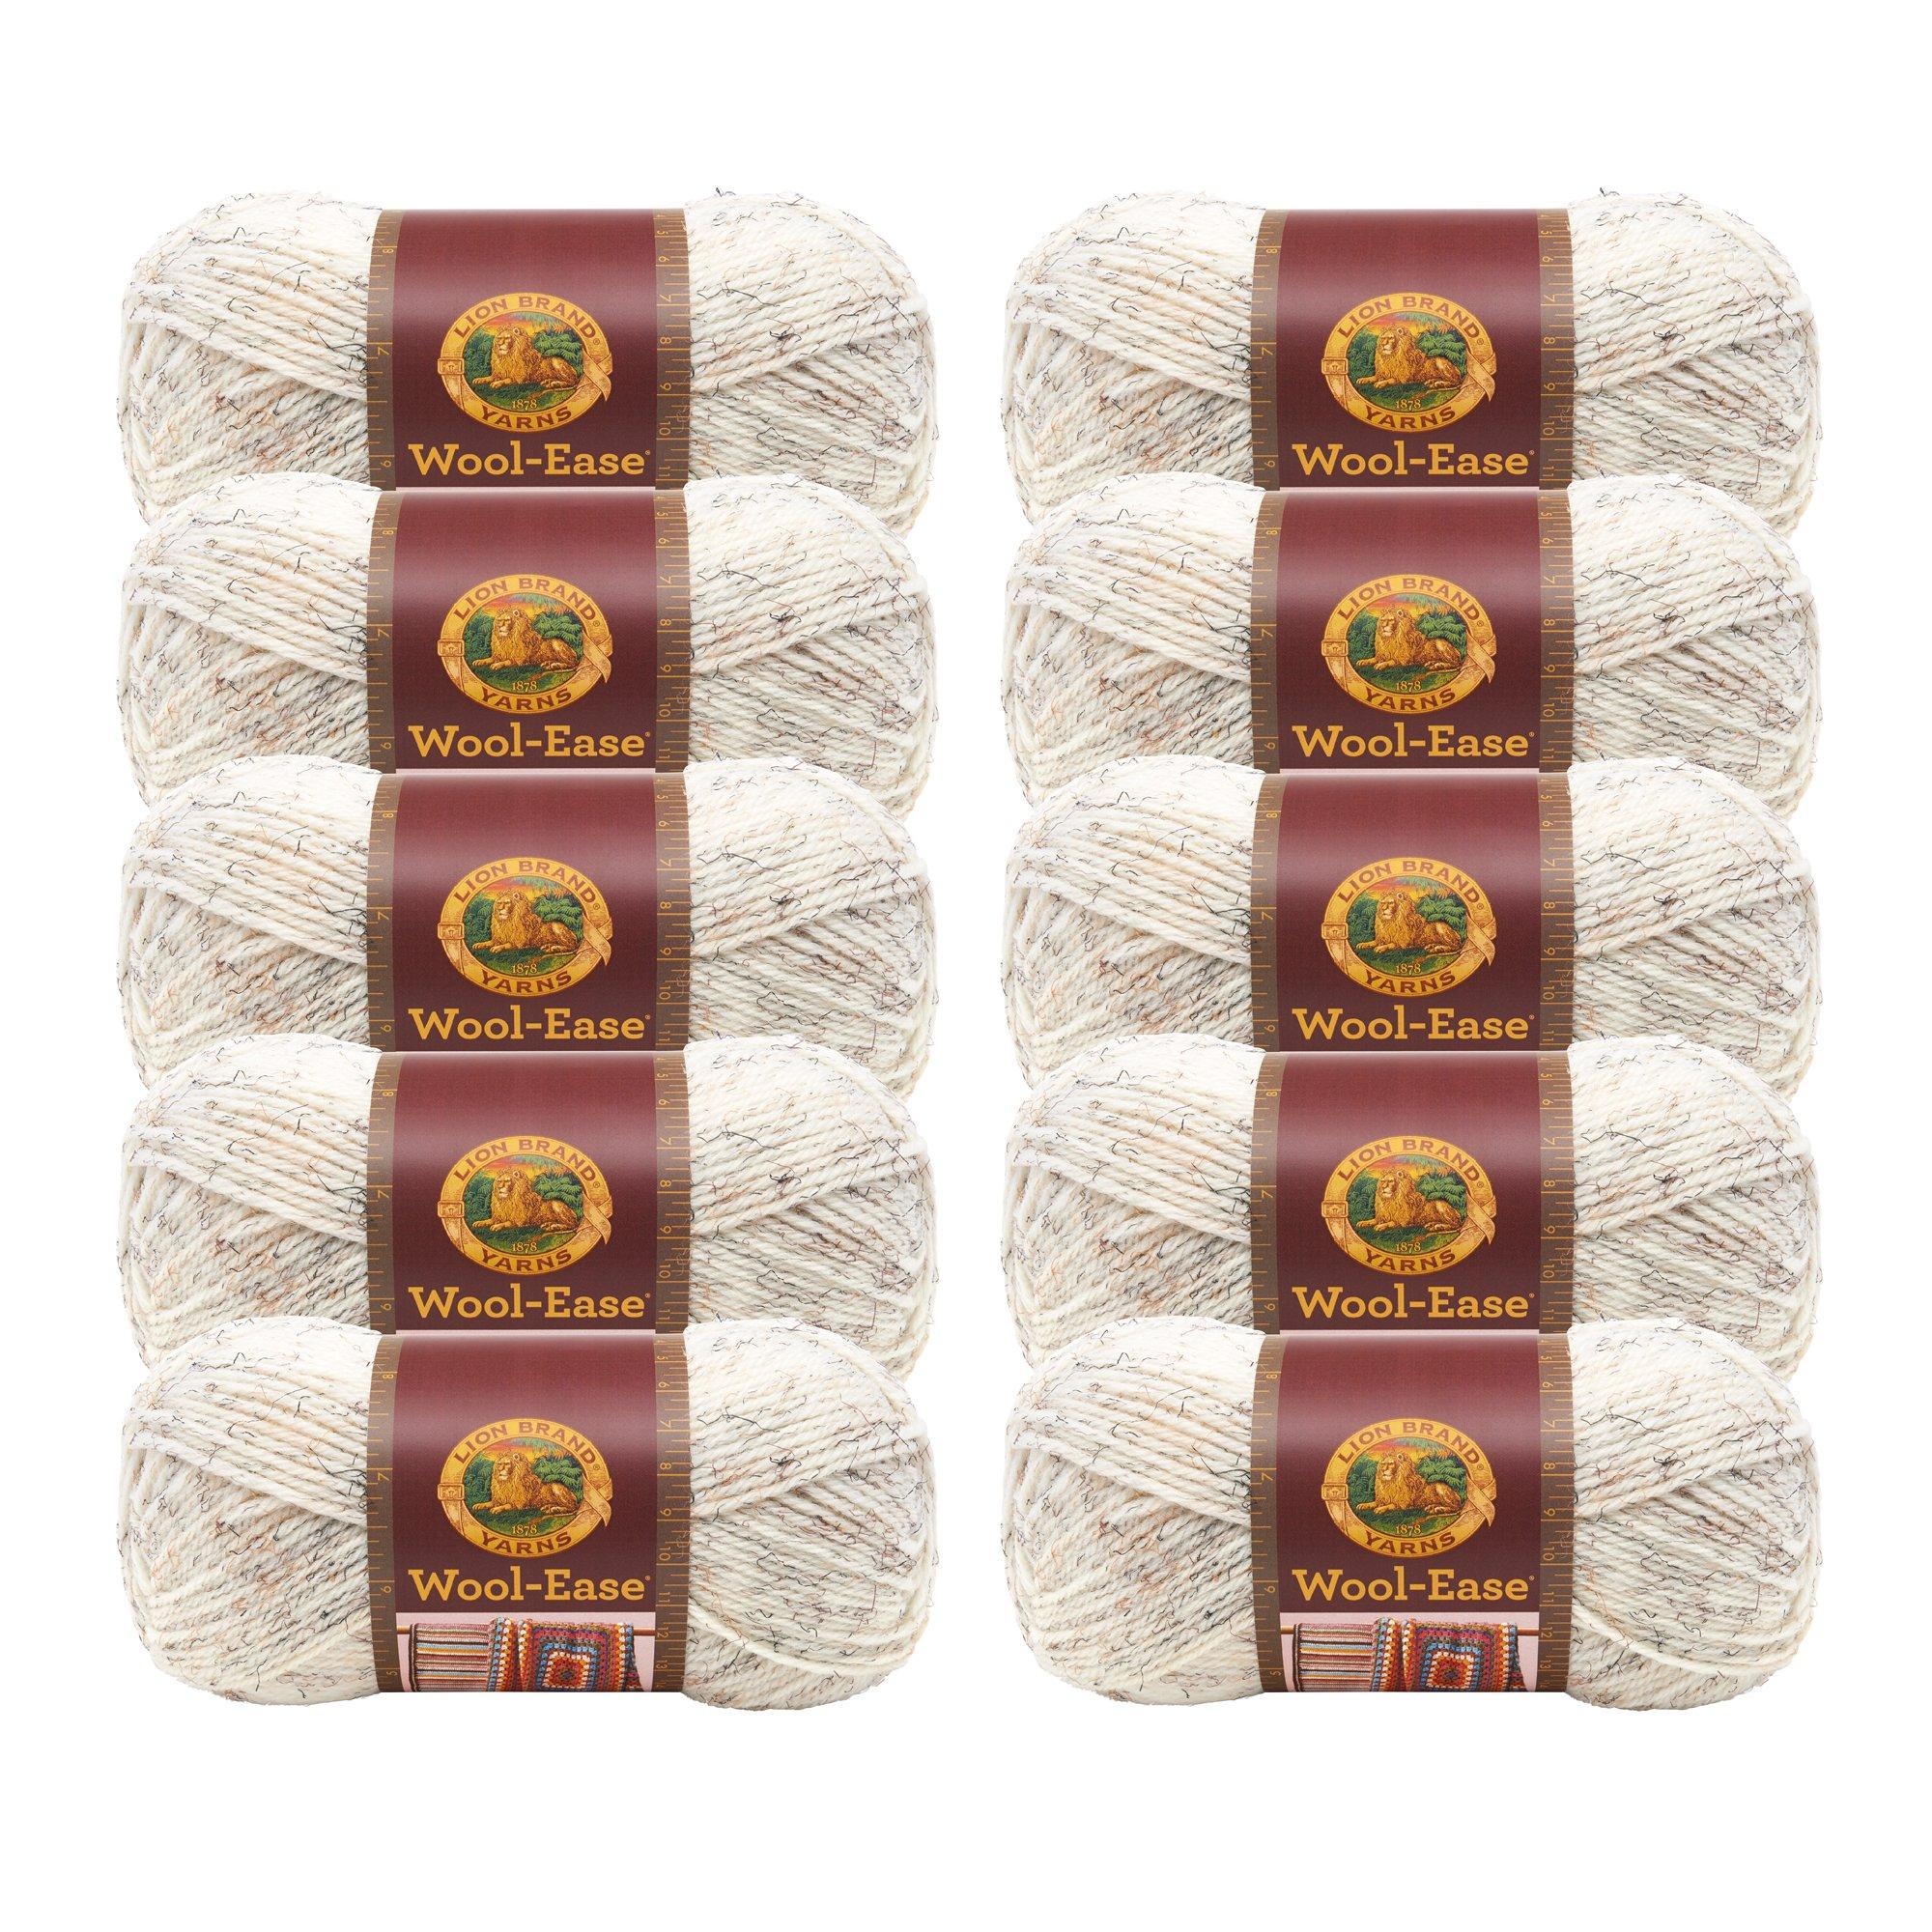 (10 Pack) Lion Brand Yarn 620-402 Wool-Ease Yarn, Wheat